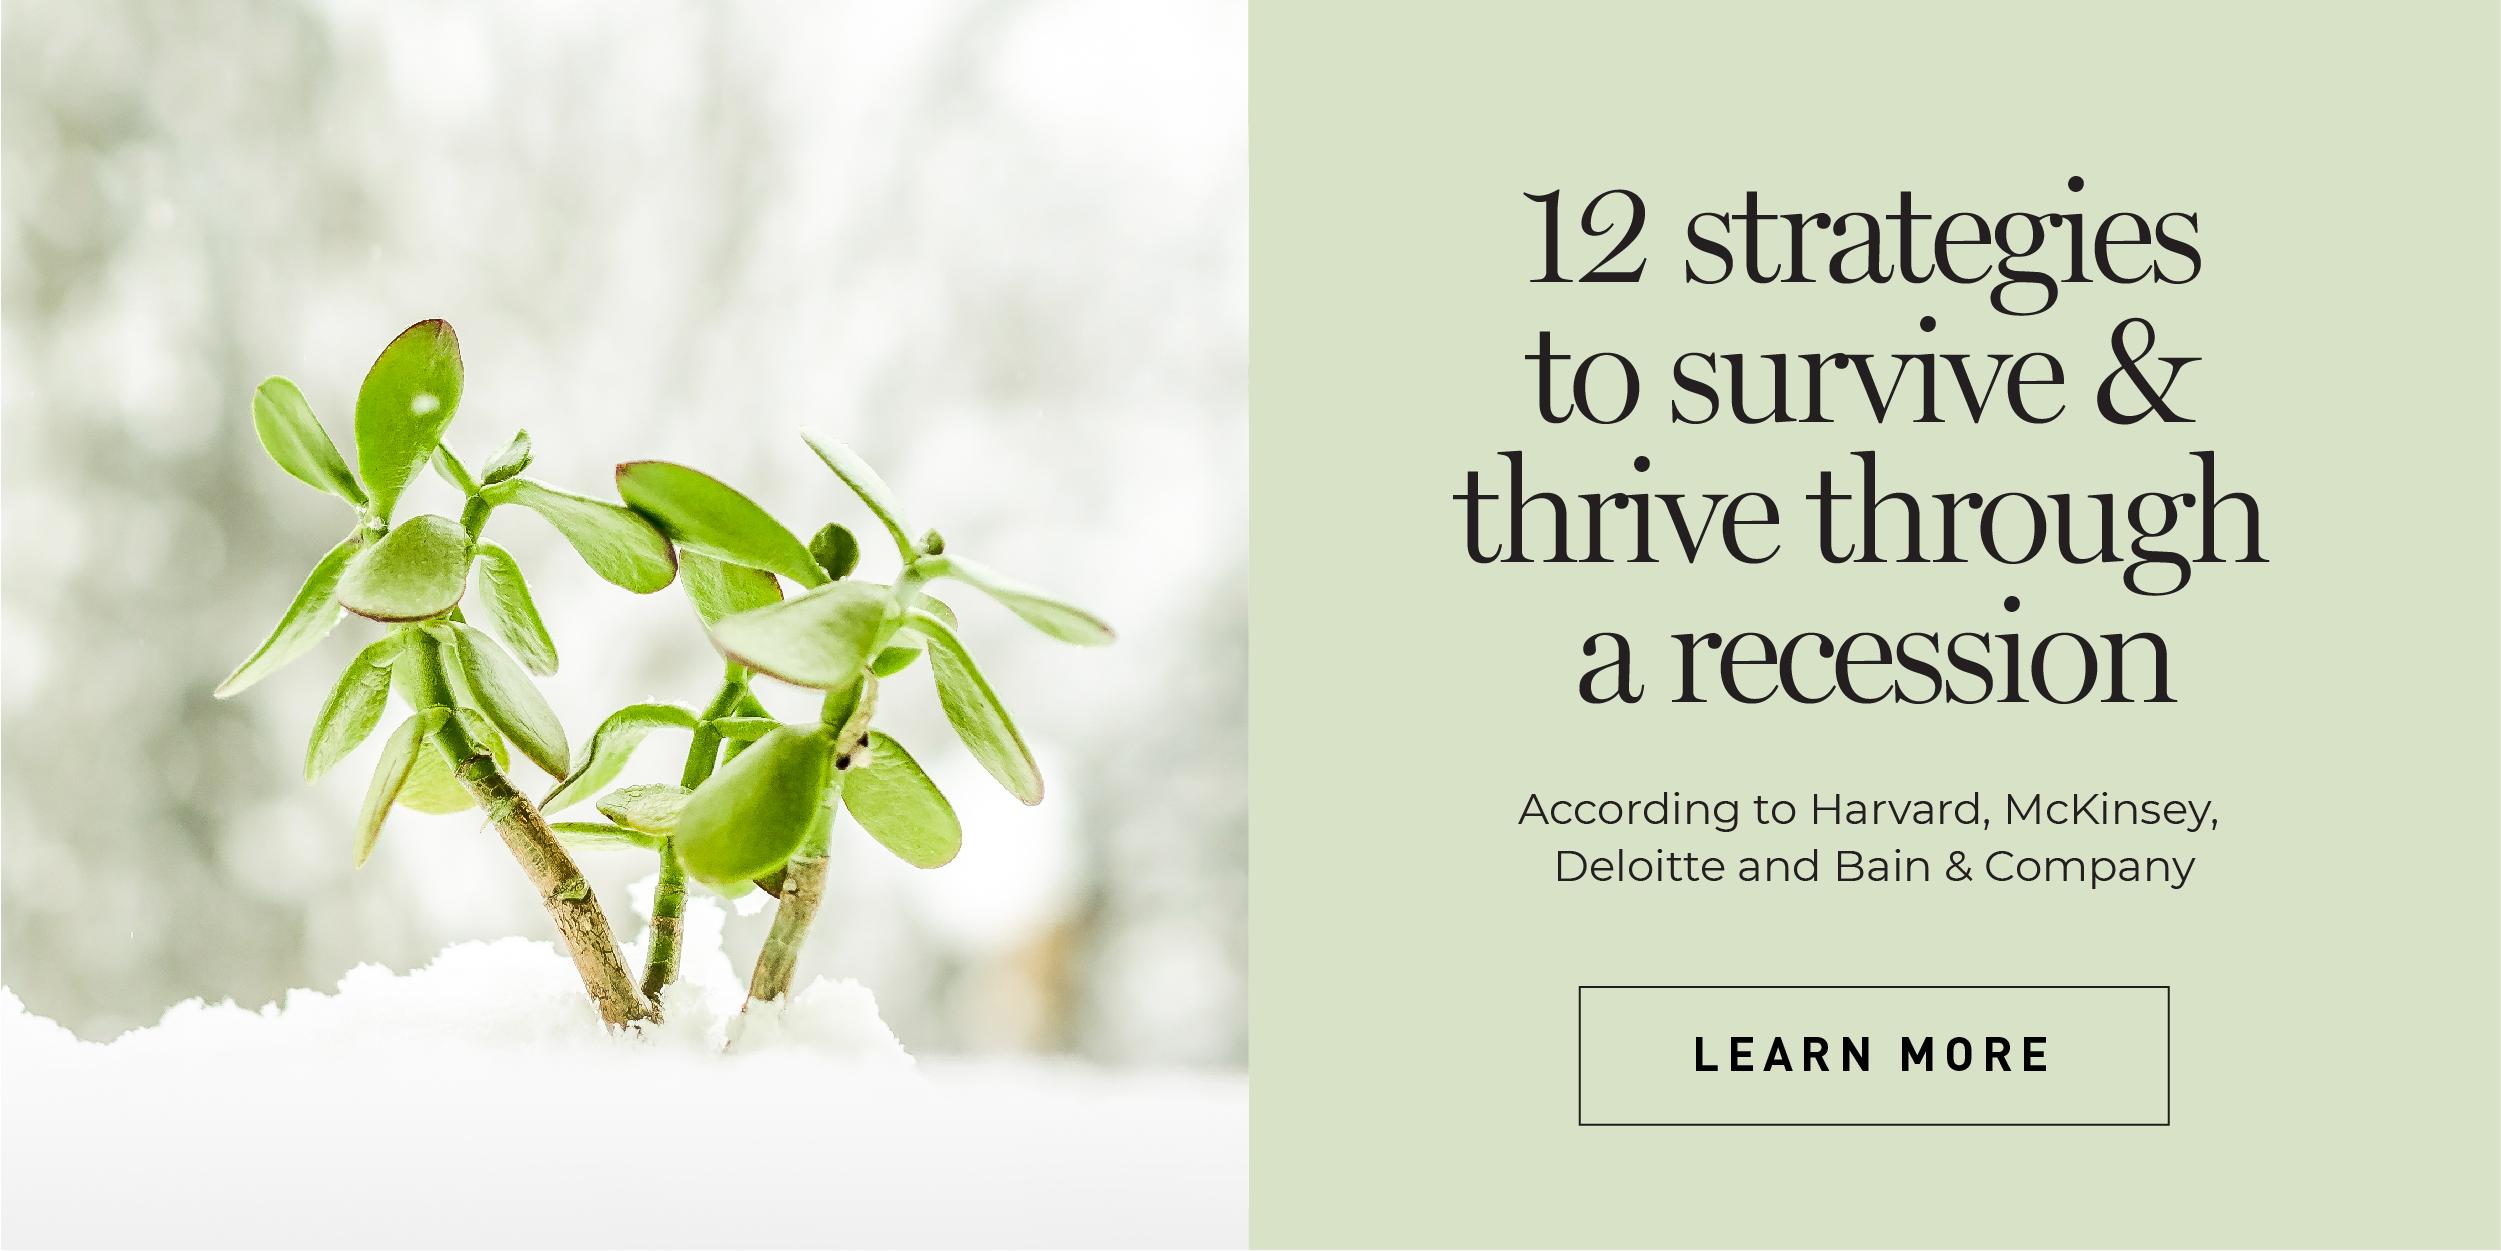 Recession Survival Strategies Harvard McKinsey Deloitte